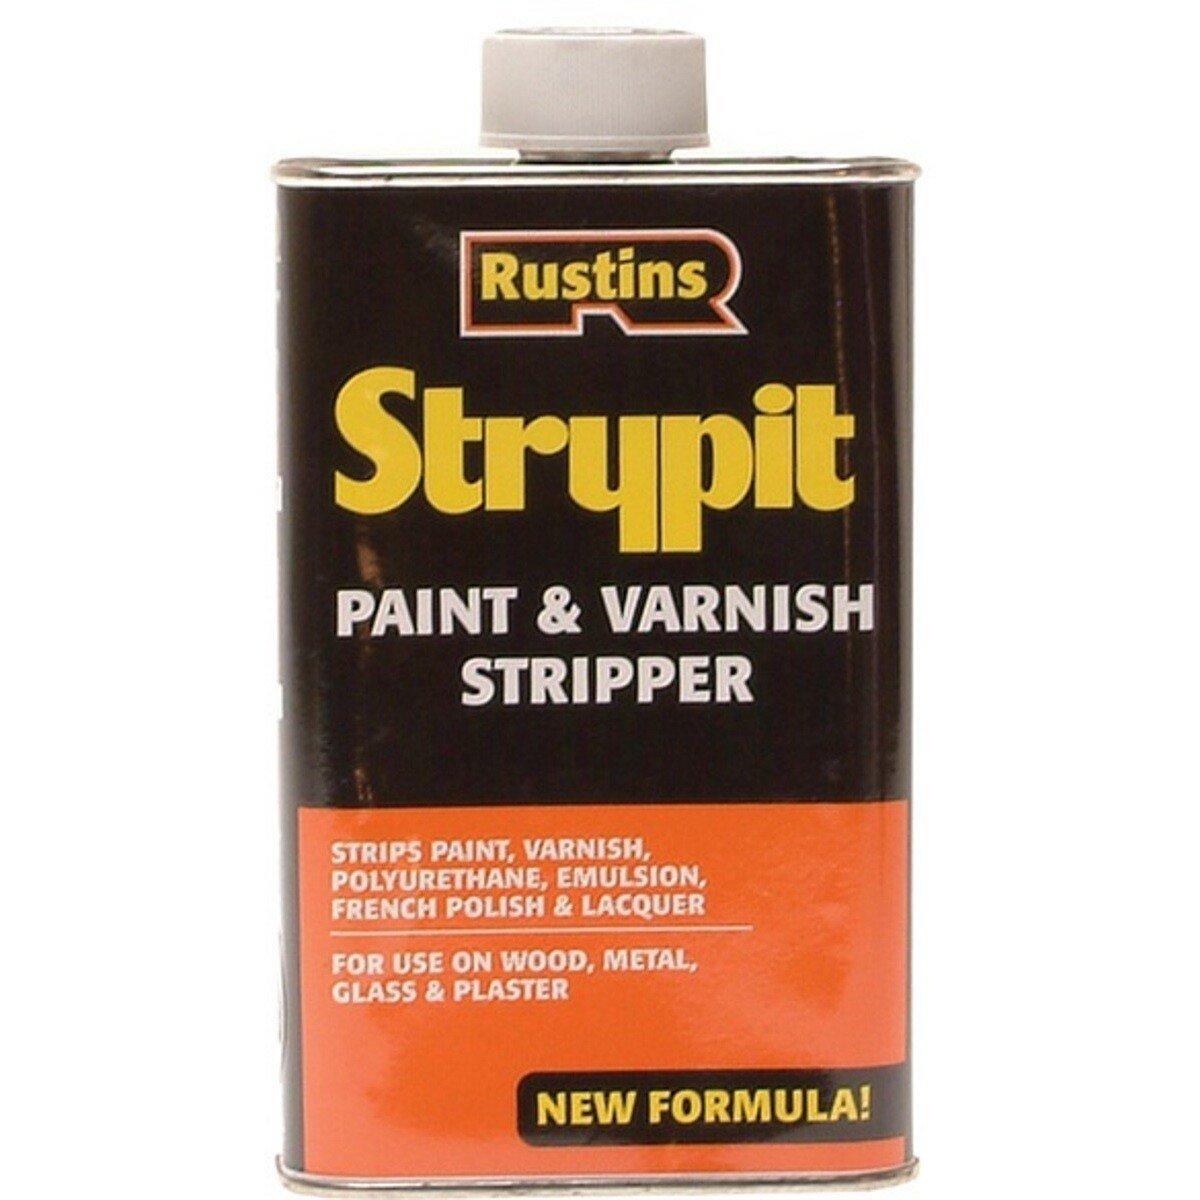 Rustins STNF500 Strypit Paint & Varnish Stripper New Formulation 500ml RUSNFS500